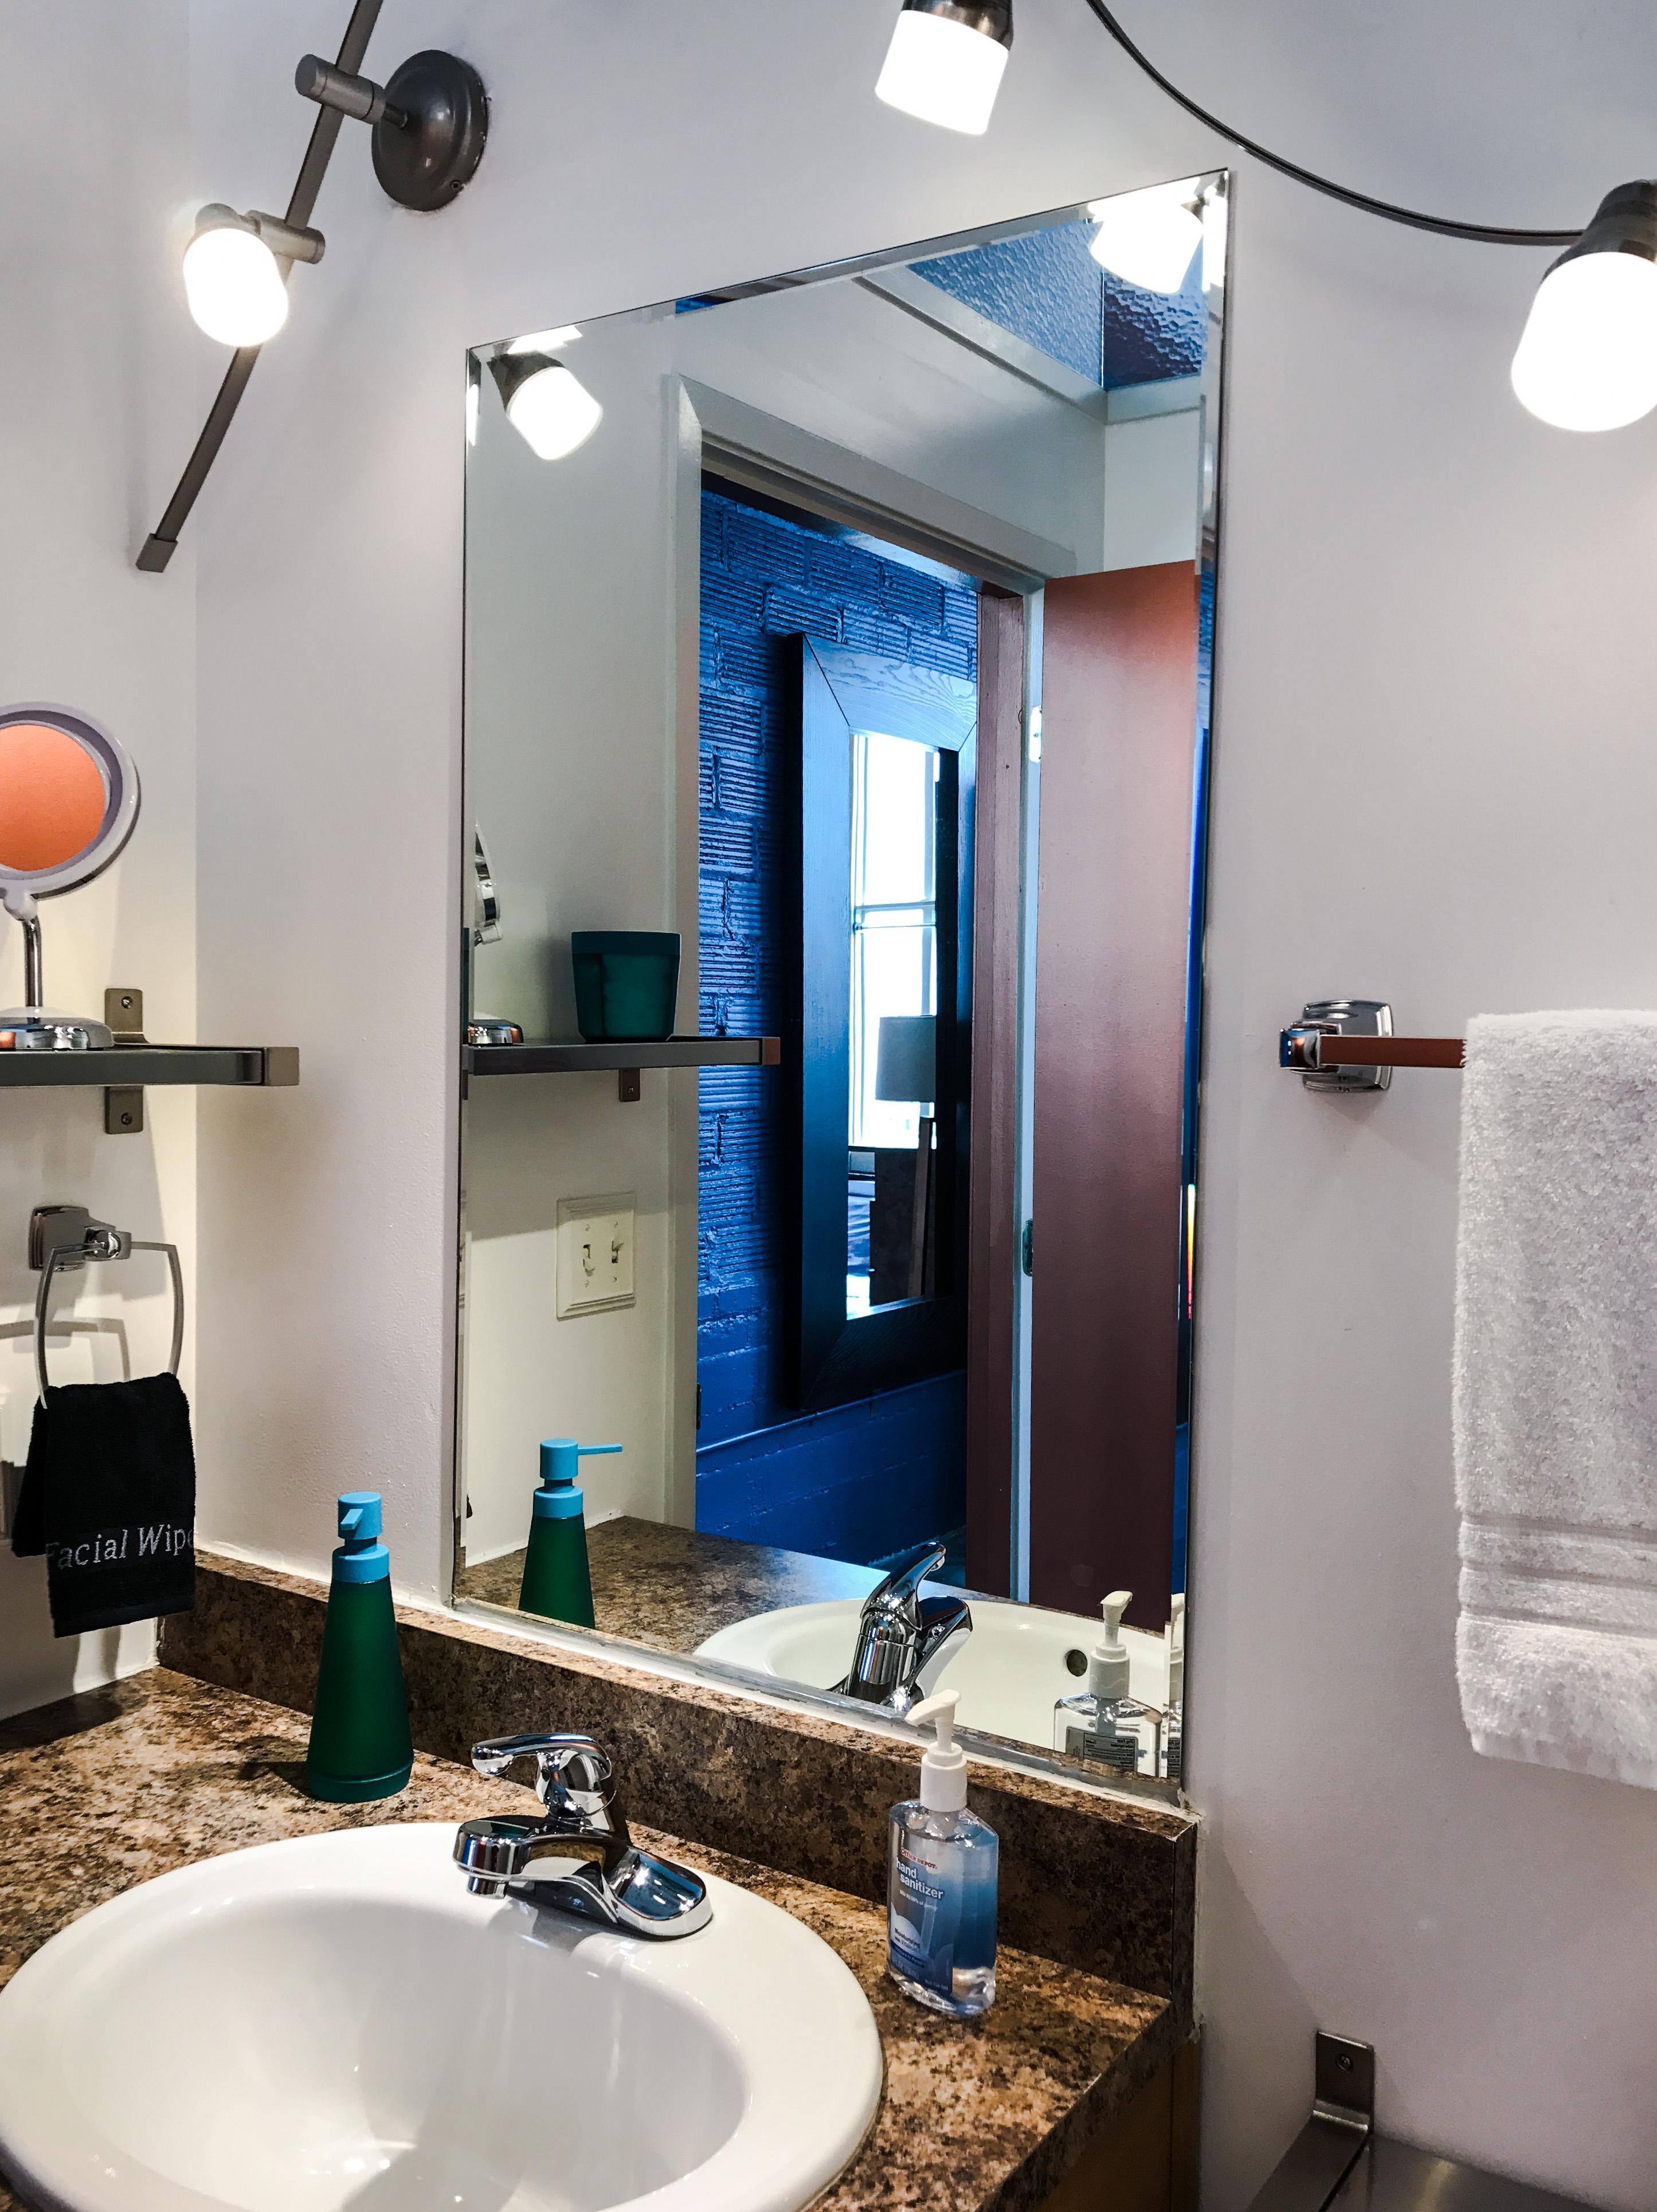 Loft Reverie Hotel 806 - Bathroom + Amenities + Facial Towel + Vanity Mirror + Towels + Soap + Cotto